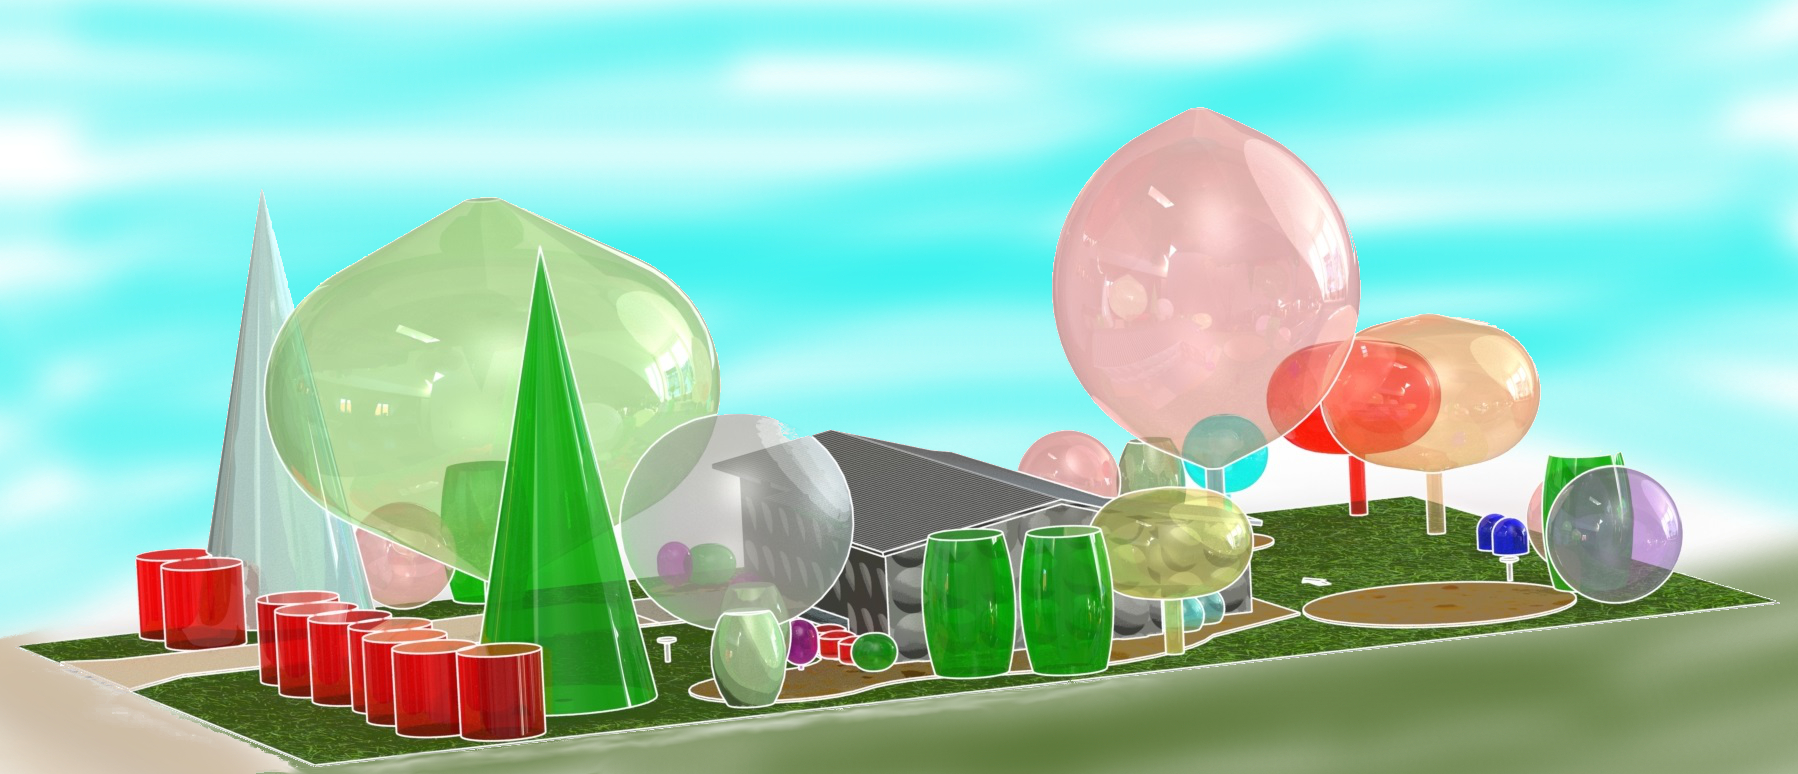 RENDERING - Landscaping Site Plan - SolidWorks CAD - cartoon 3 Sky